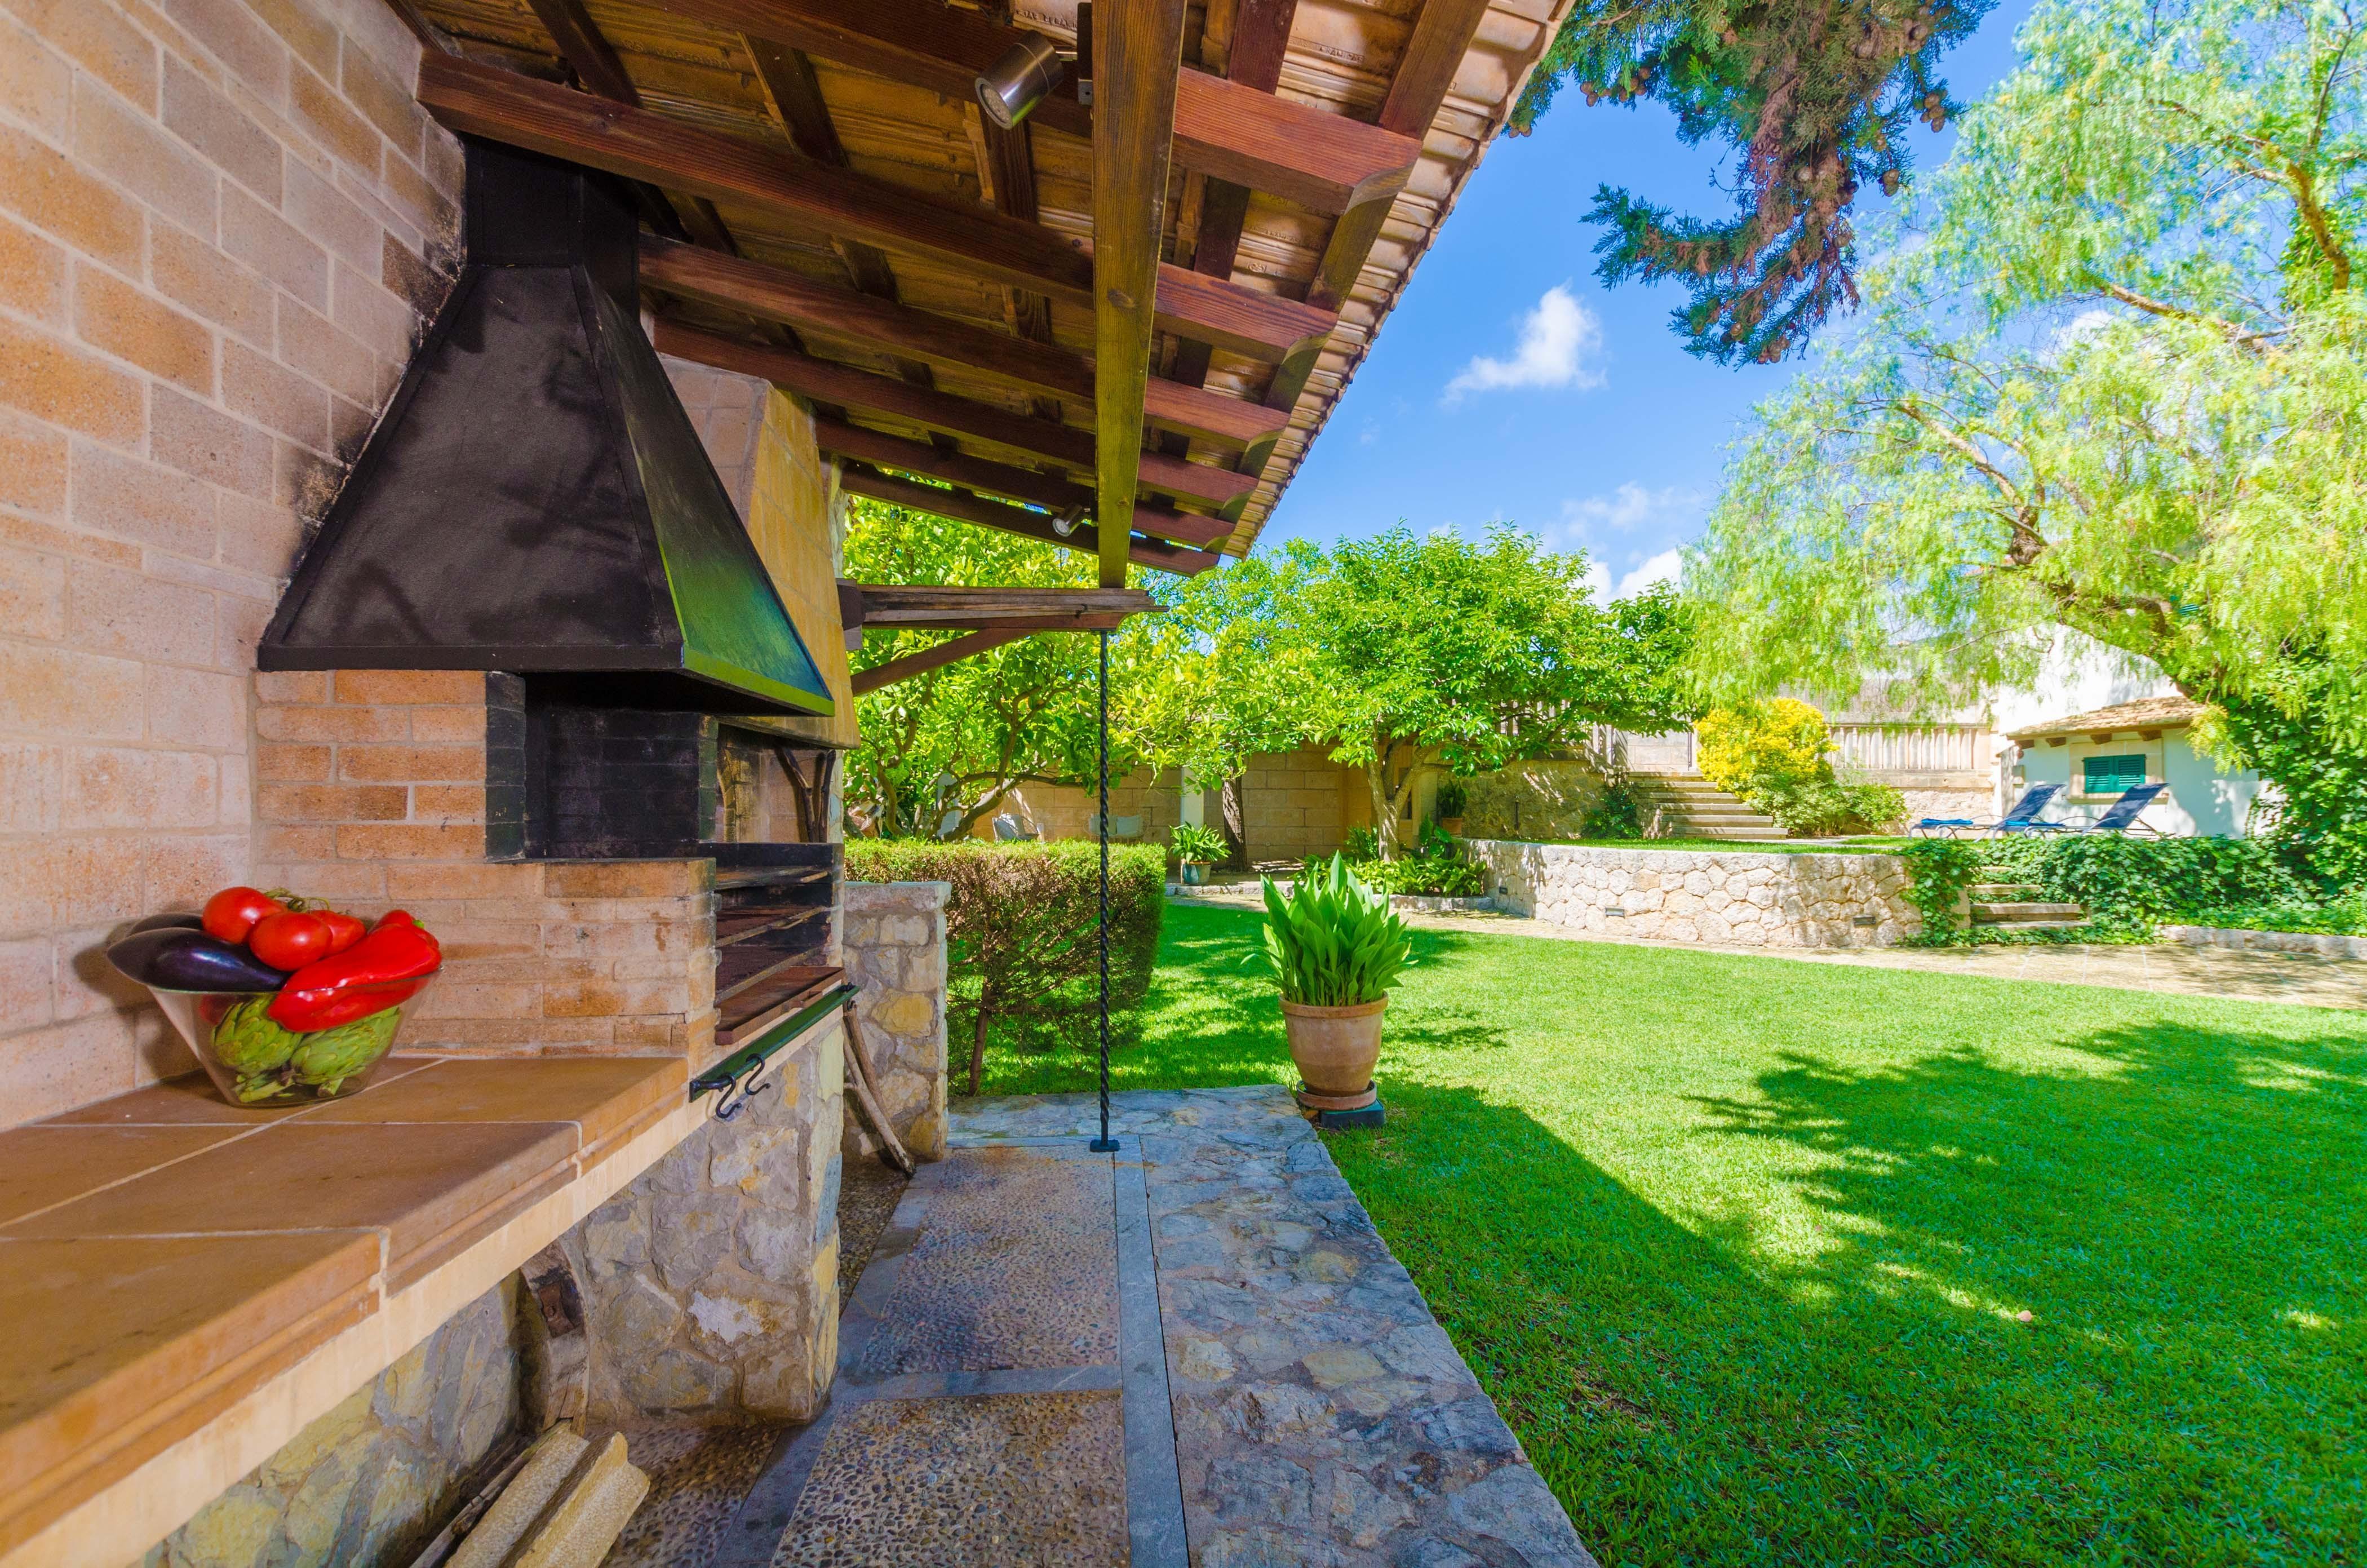 Maison de vacances CAS CONVIDATS (2435013), Alaro, Majorque, Iles Baléares, Espagne, image 70